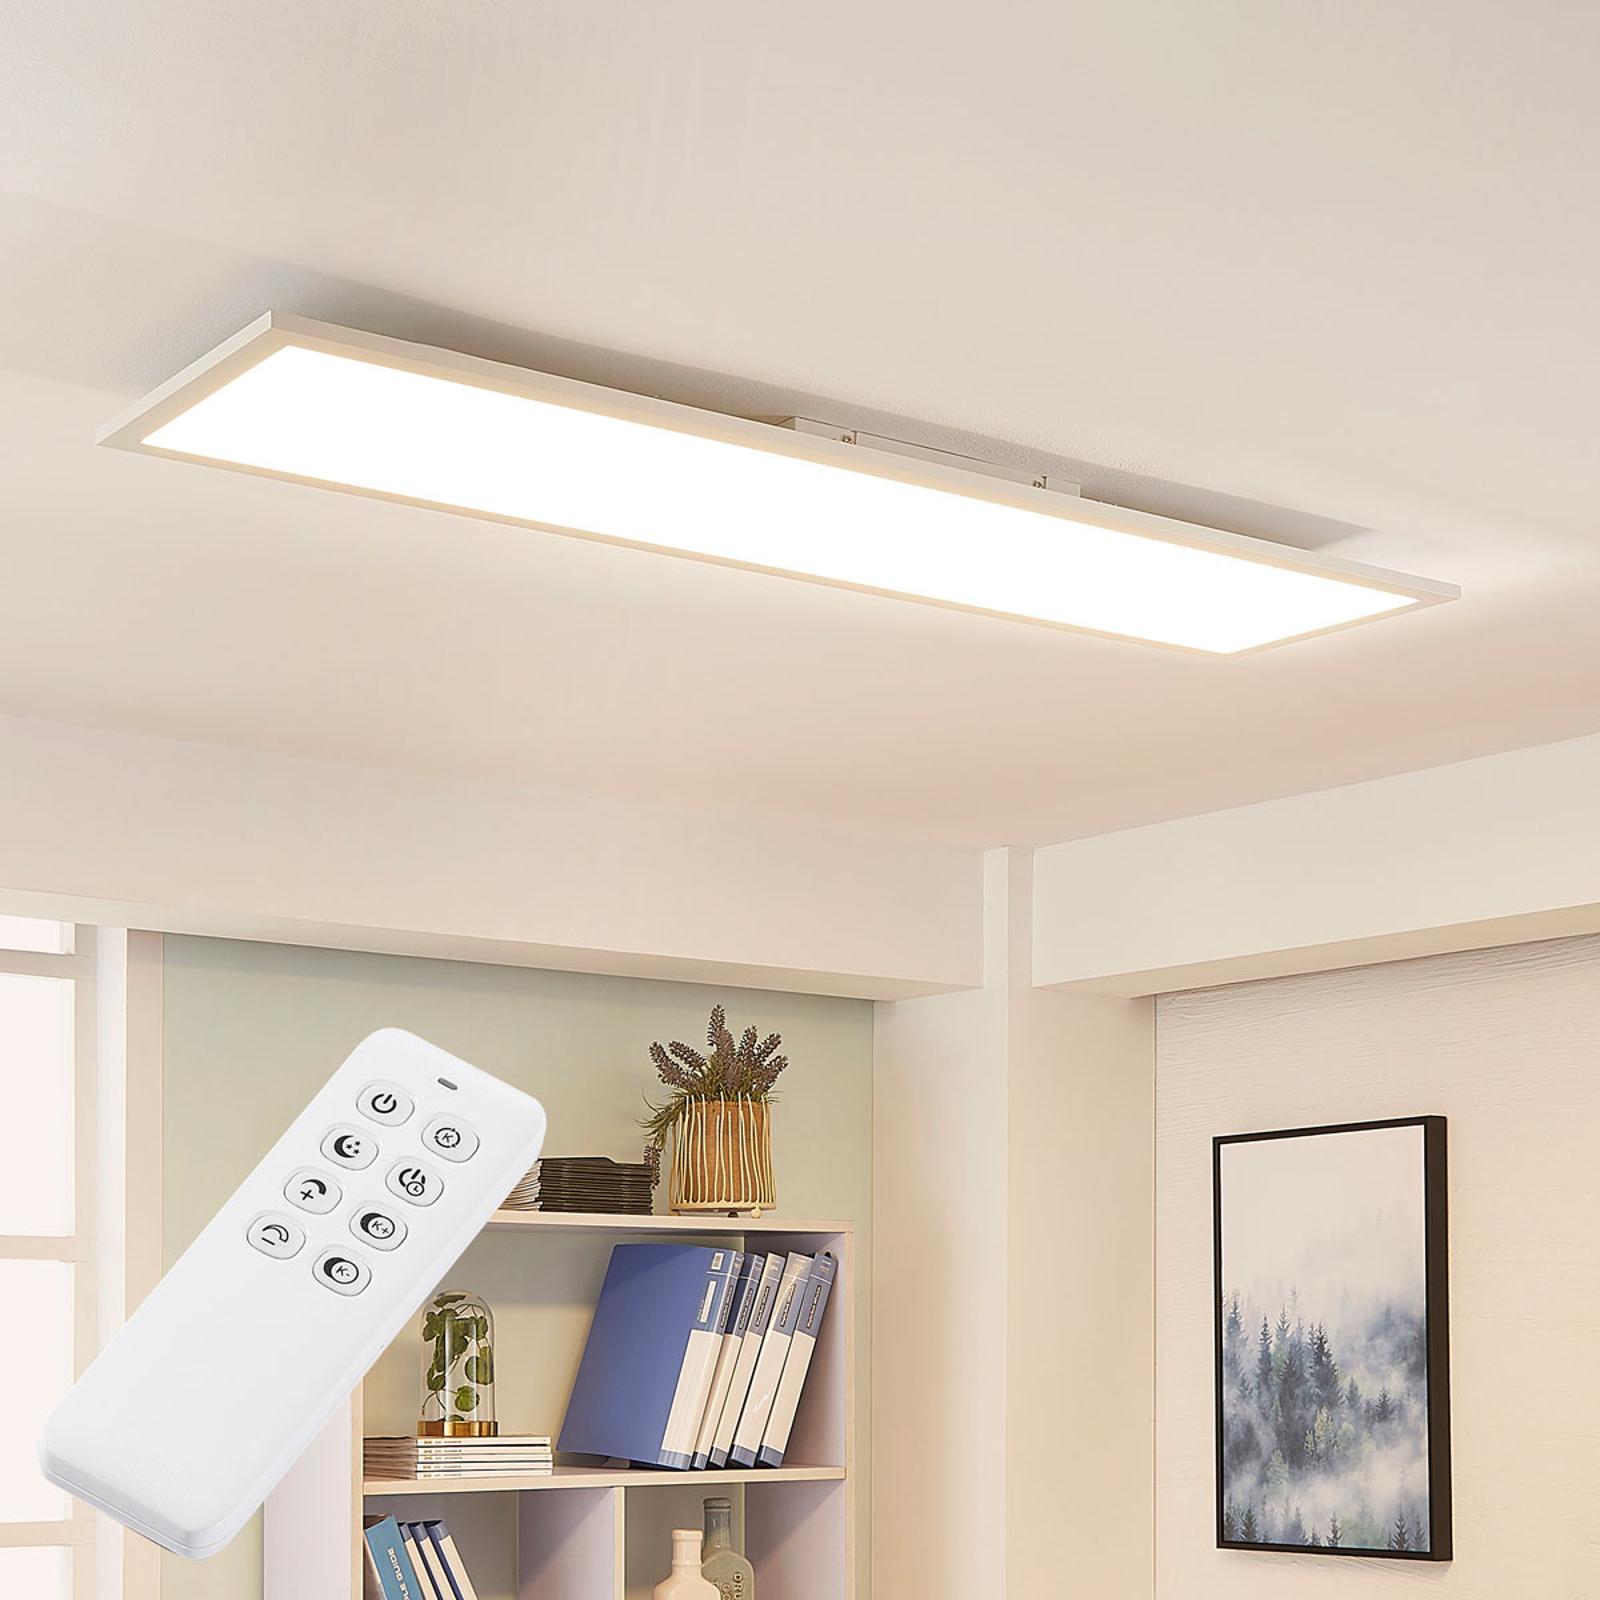 Lysander white LED ceiling light, dimmable_9621560_1